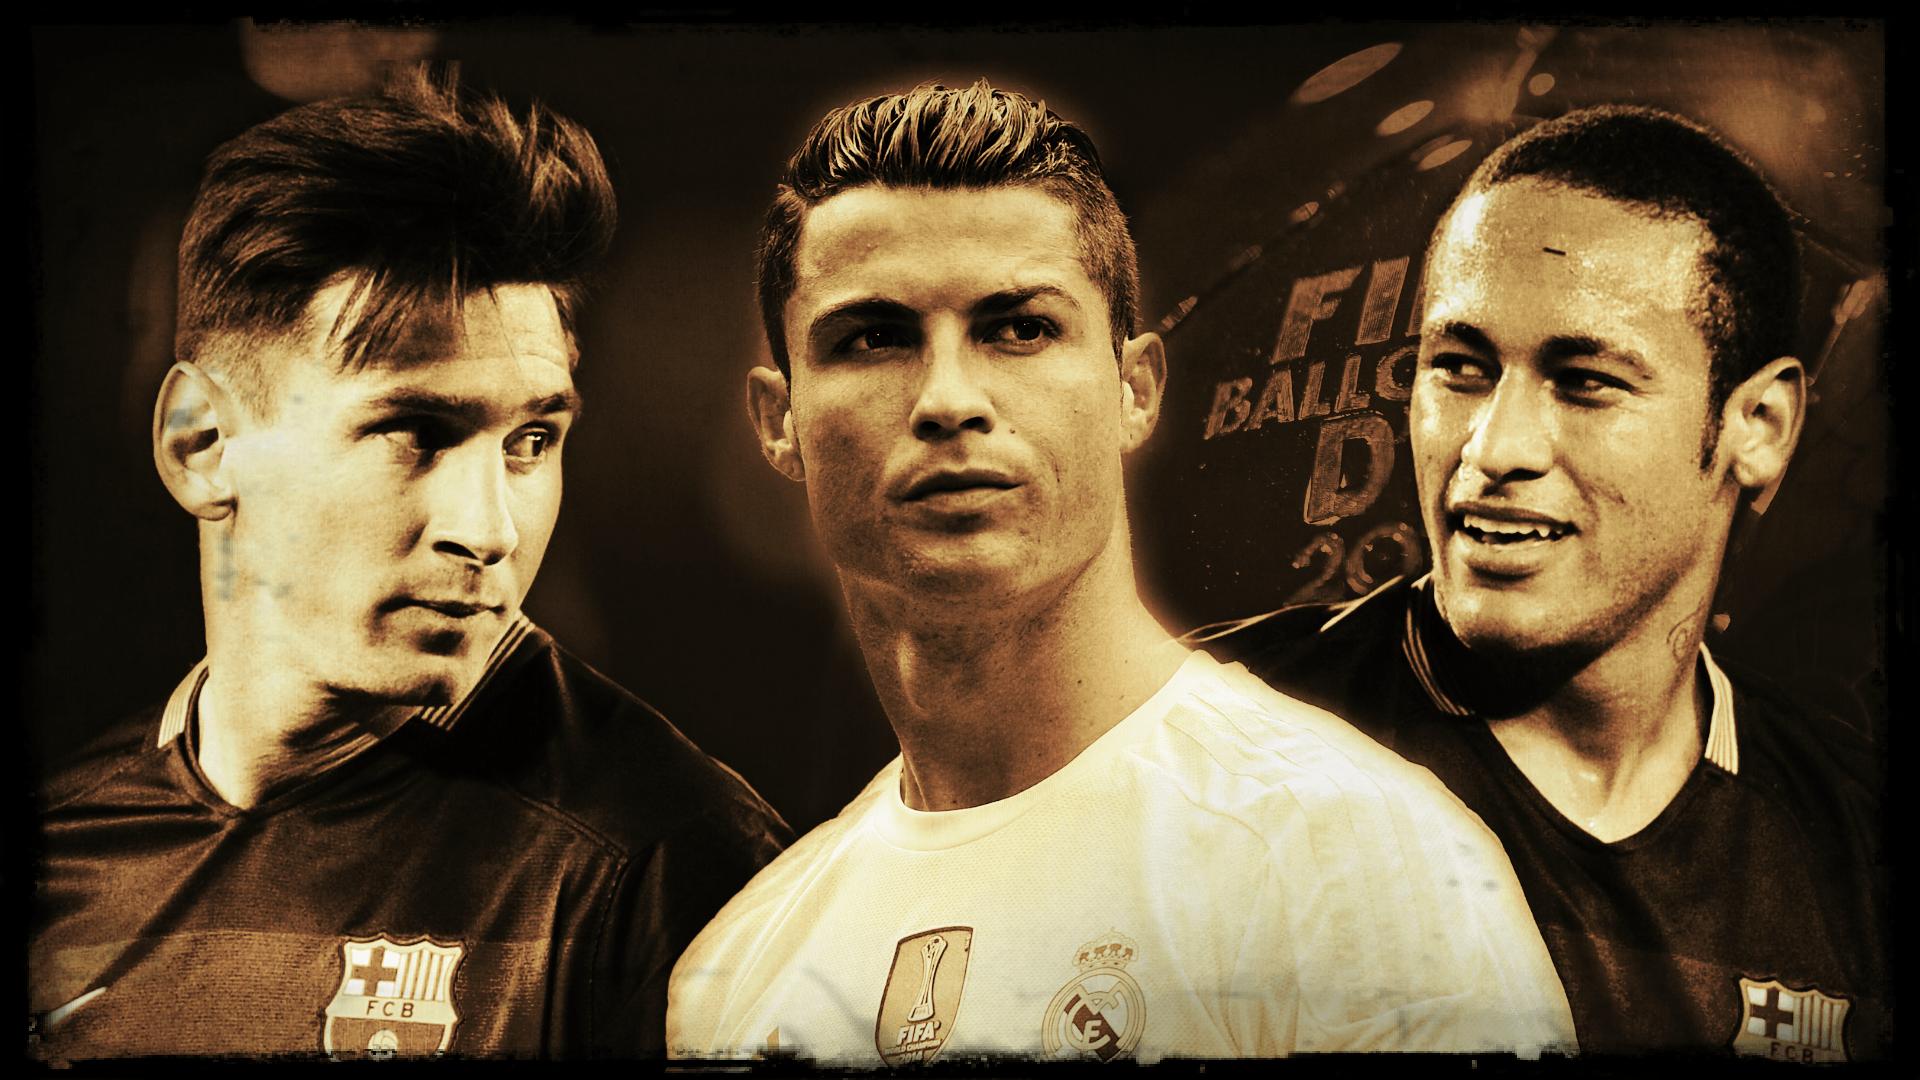 Messi Ronaldo Neymar Wallpapers Wallpaper Cave